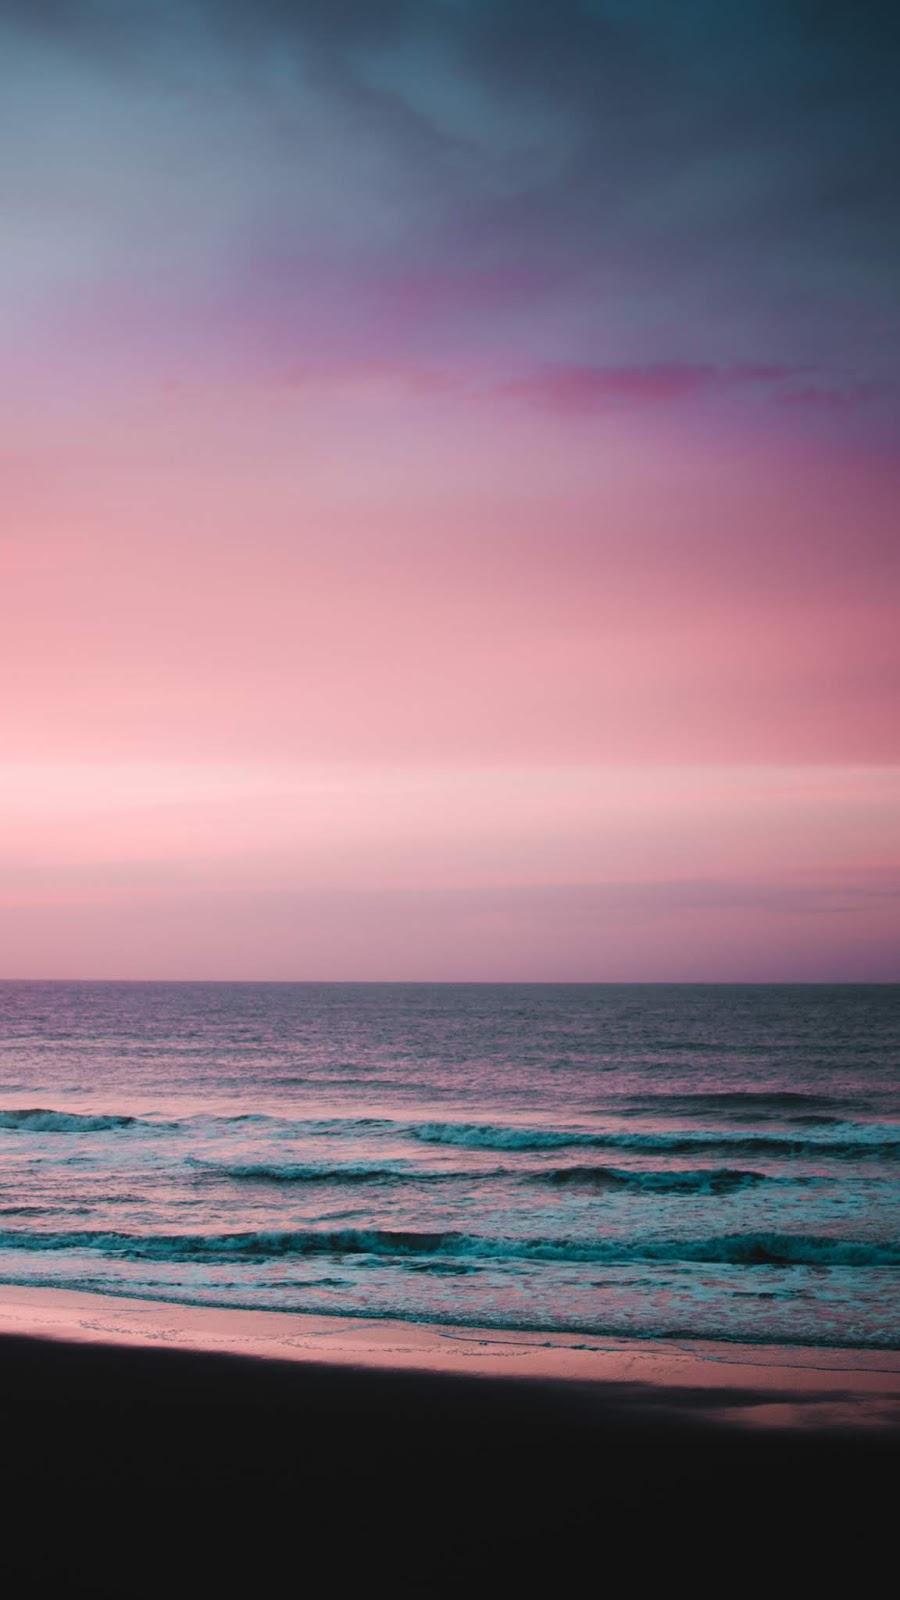 Calm beach in the twilight